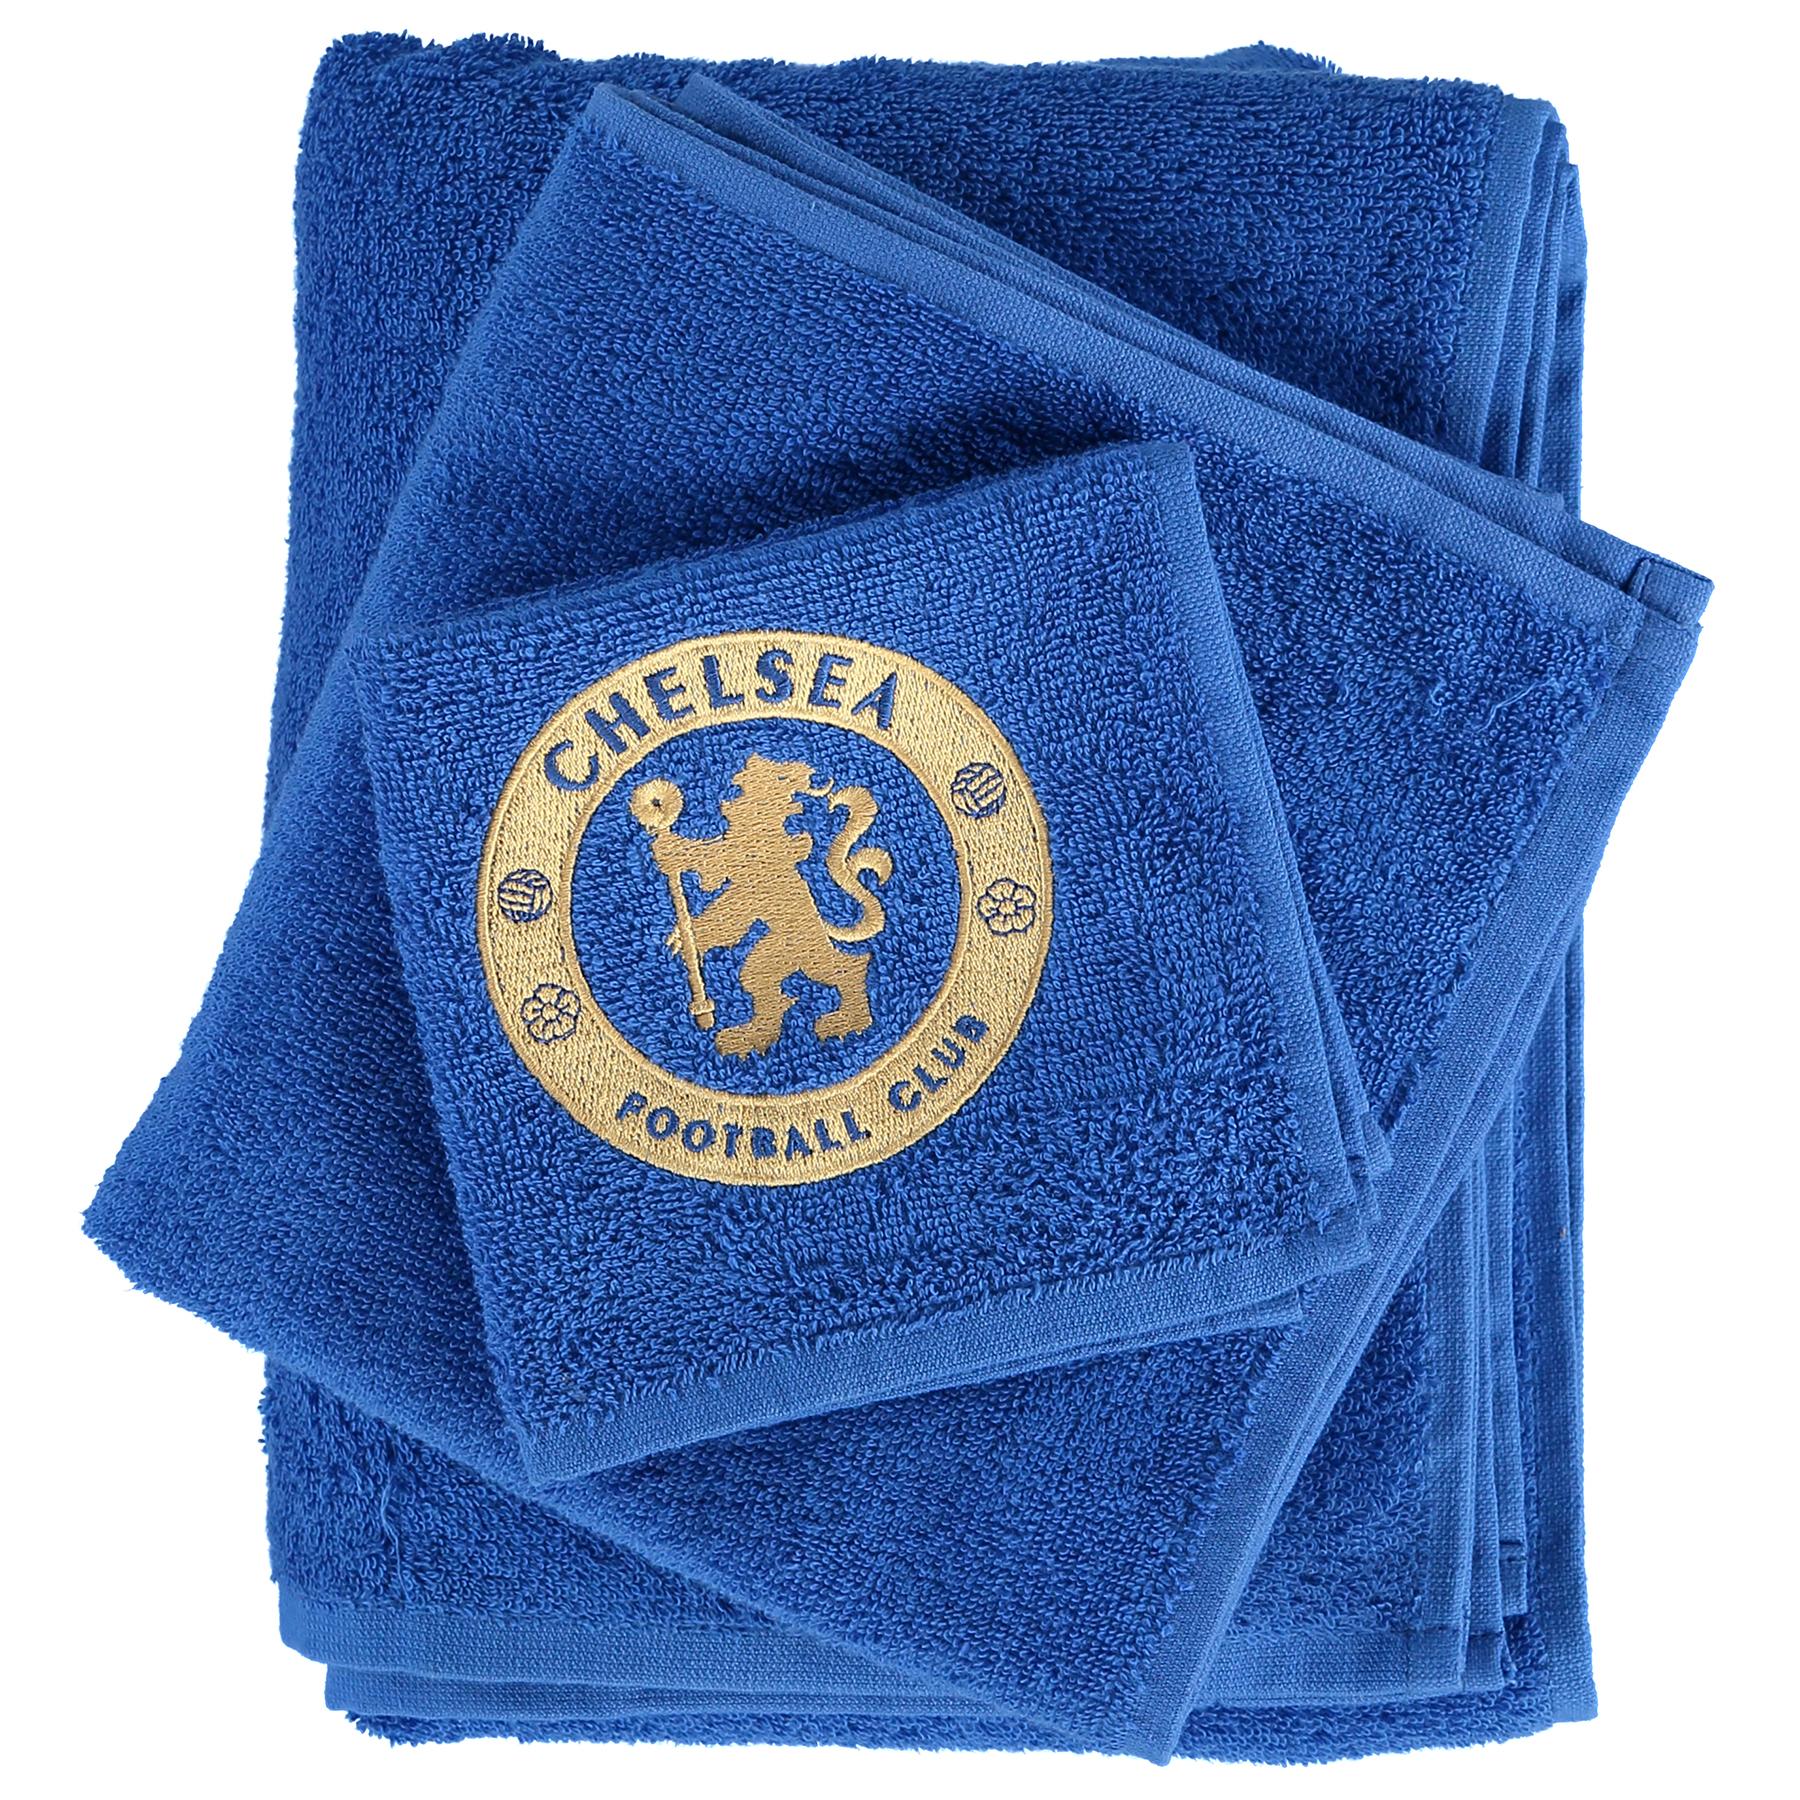 Chelsea Jacquard Towel Set